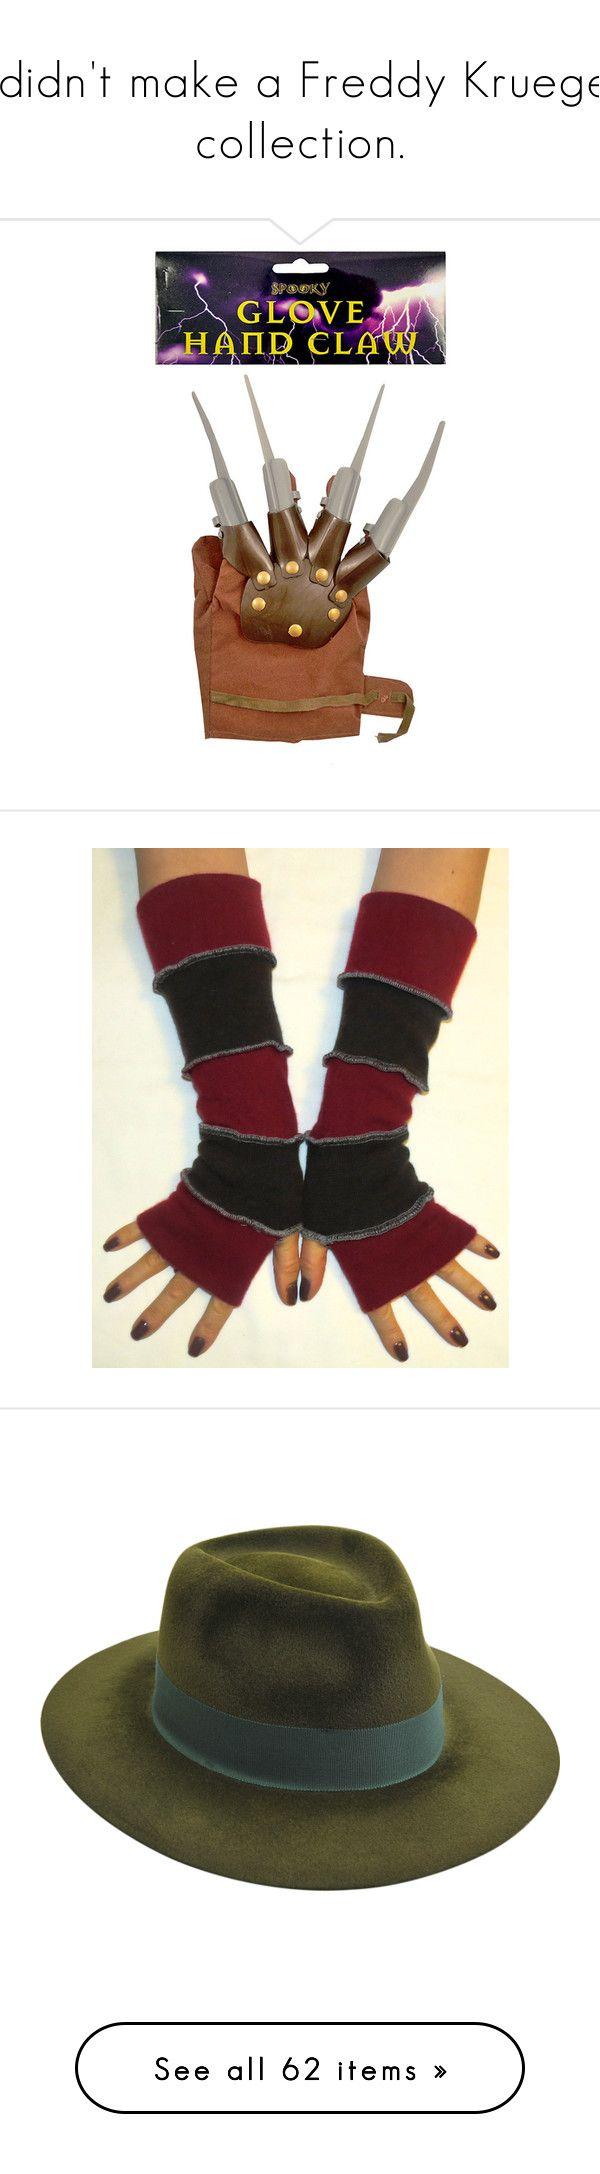 Fingerless gloves edmonton -  I Didn T Make A Freddy Krueger Collection By Shulabond On Polyvore Wool Glovesfingerless